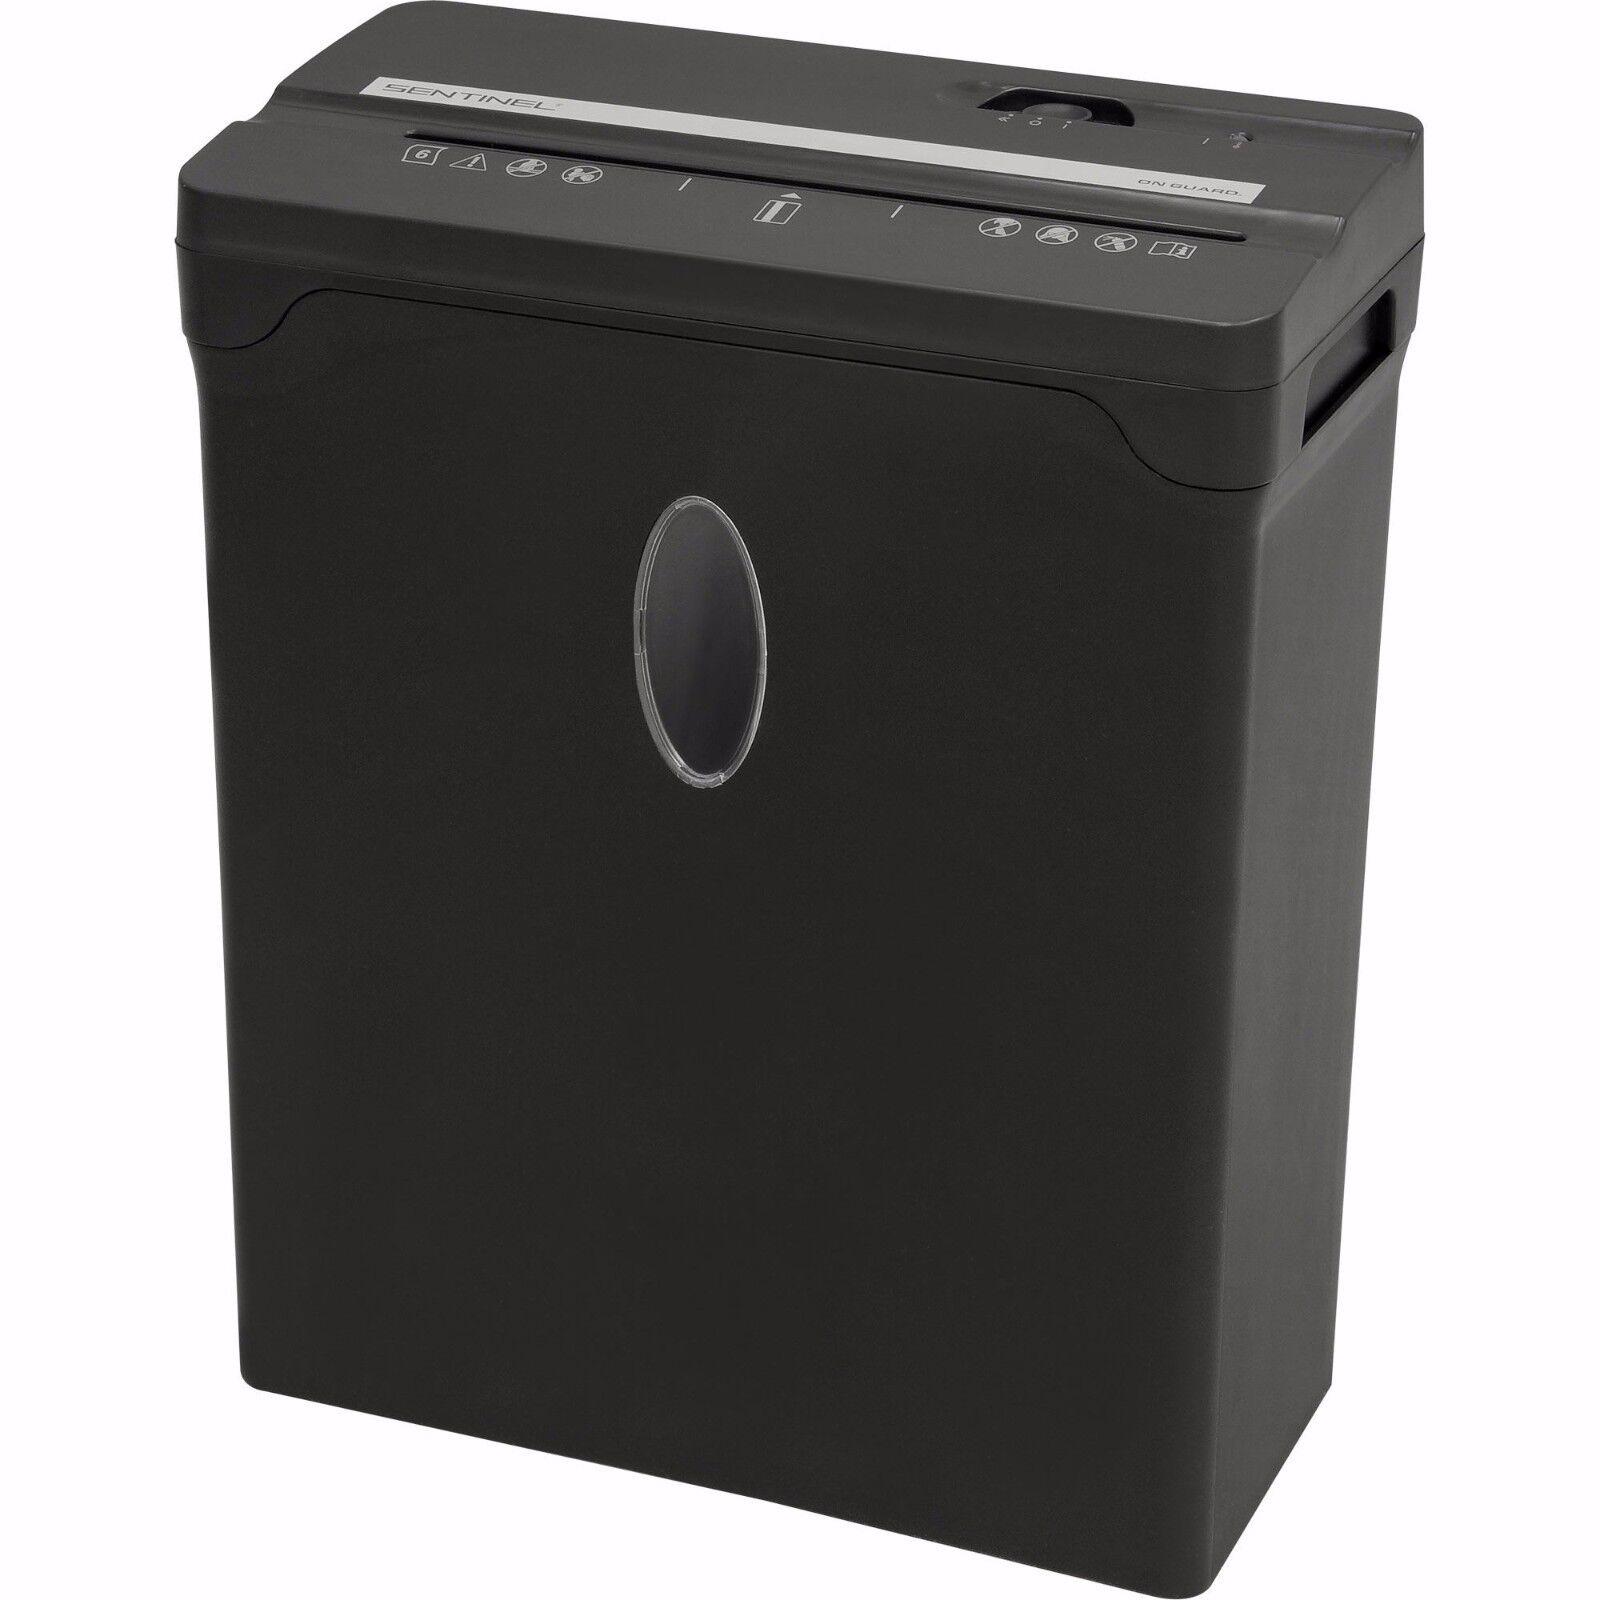 Купить Sentinel FX61B - Sentinel Compact 6 Sheet Cross-Cut Shredder Paper | Credit Cards | Black - NEW!